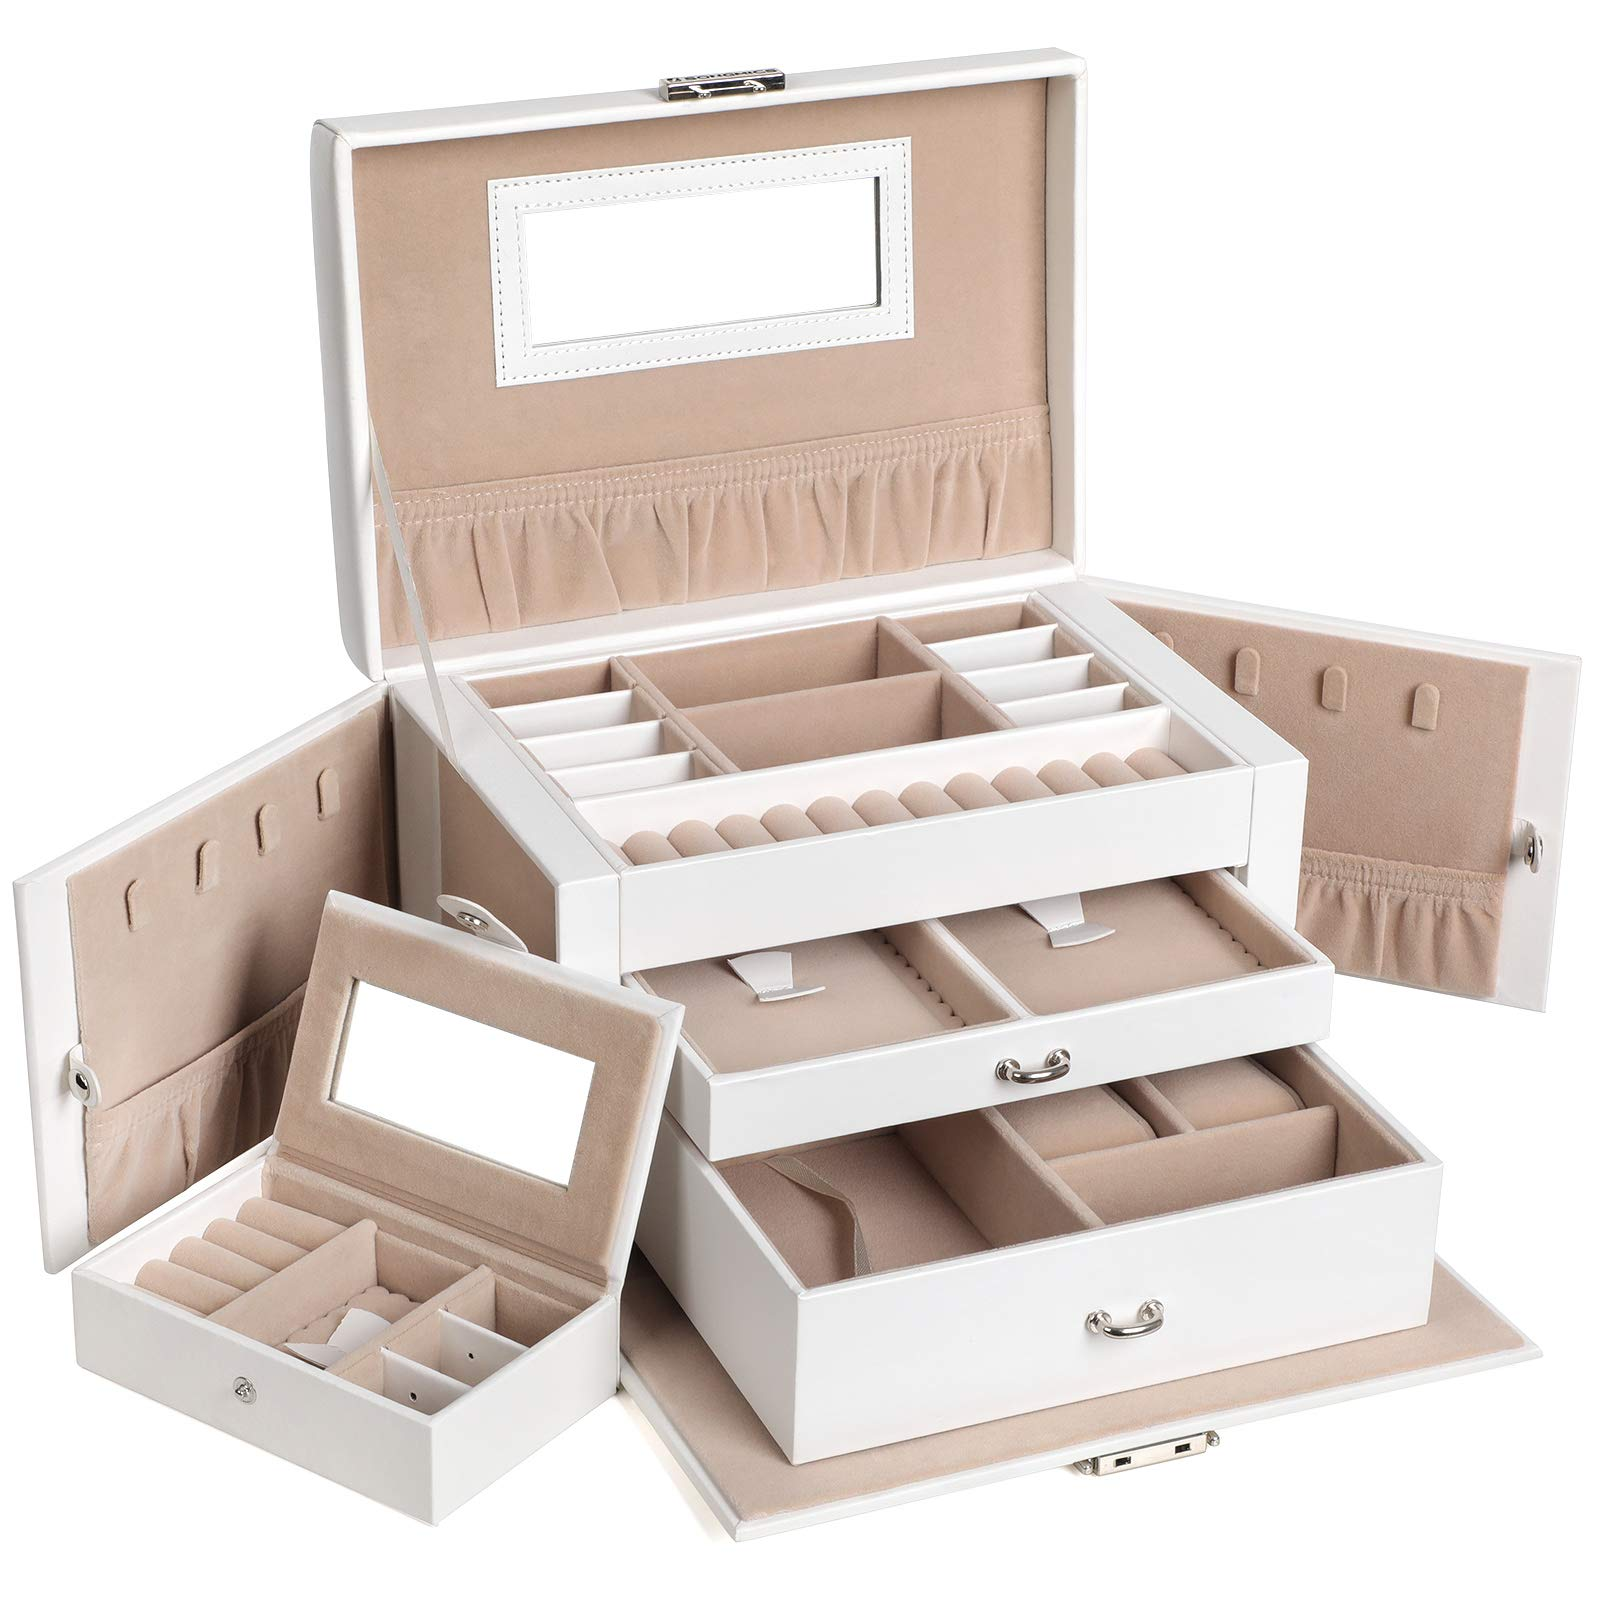 SONGMICS Jewelry Box, Girls Jewelry Organizer, Mirrored Mini Travel Case, Lockable, White UJBC121W by SONGMICS